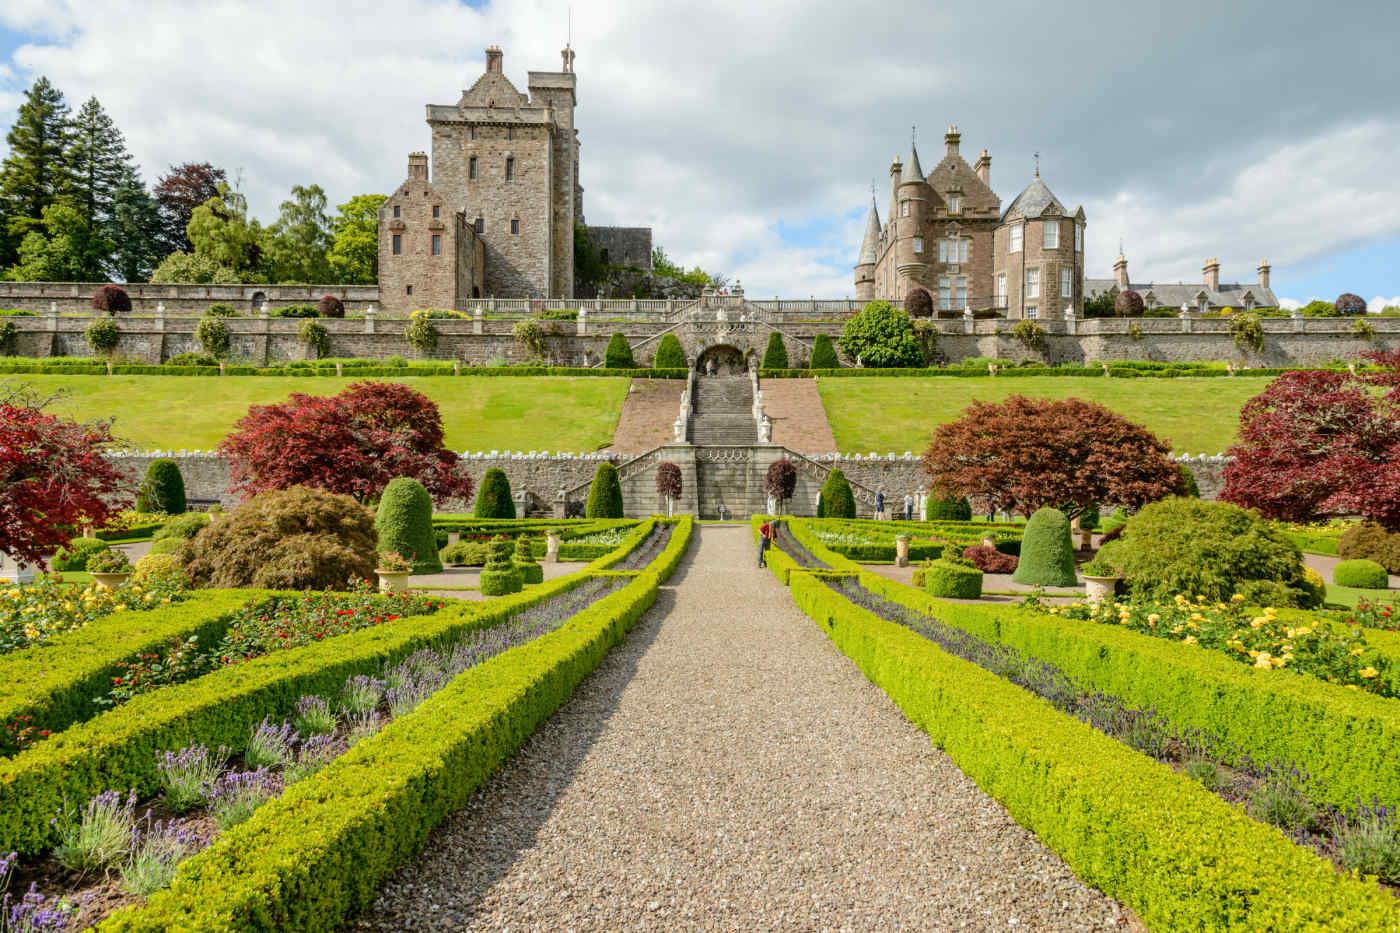 Drummond Castle, Perthshire, Scotland